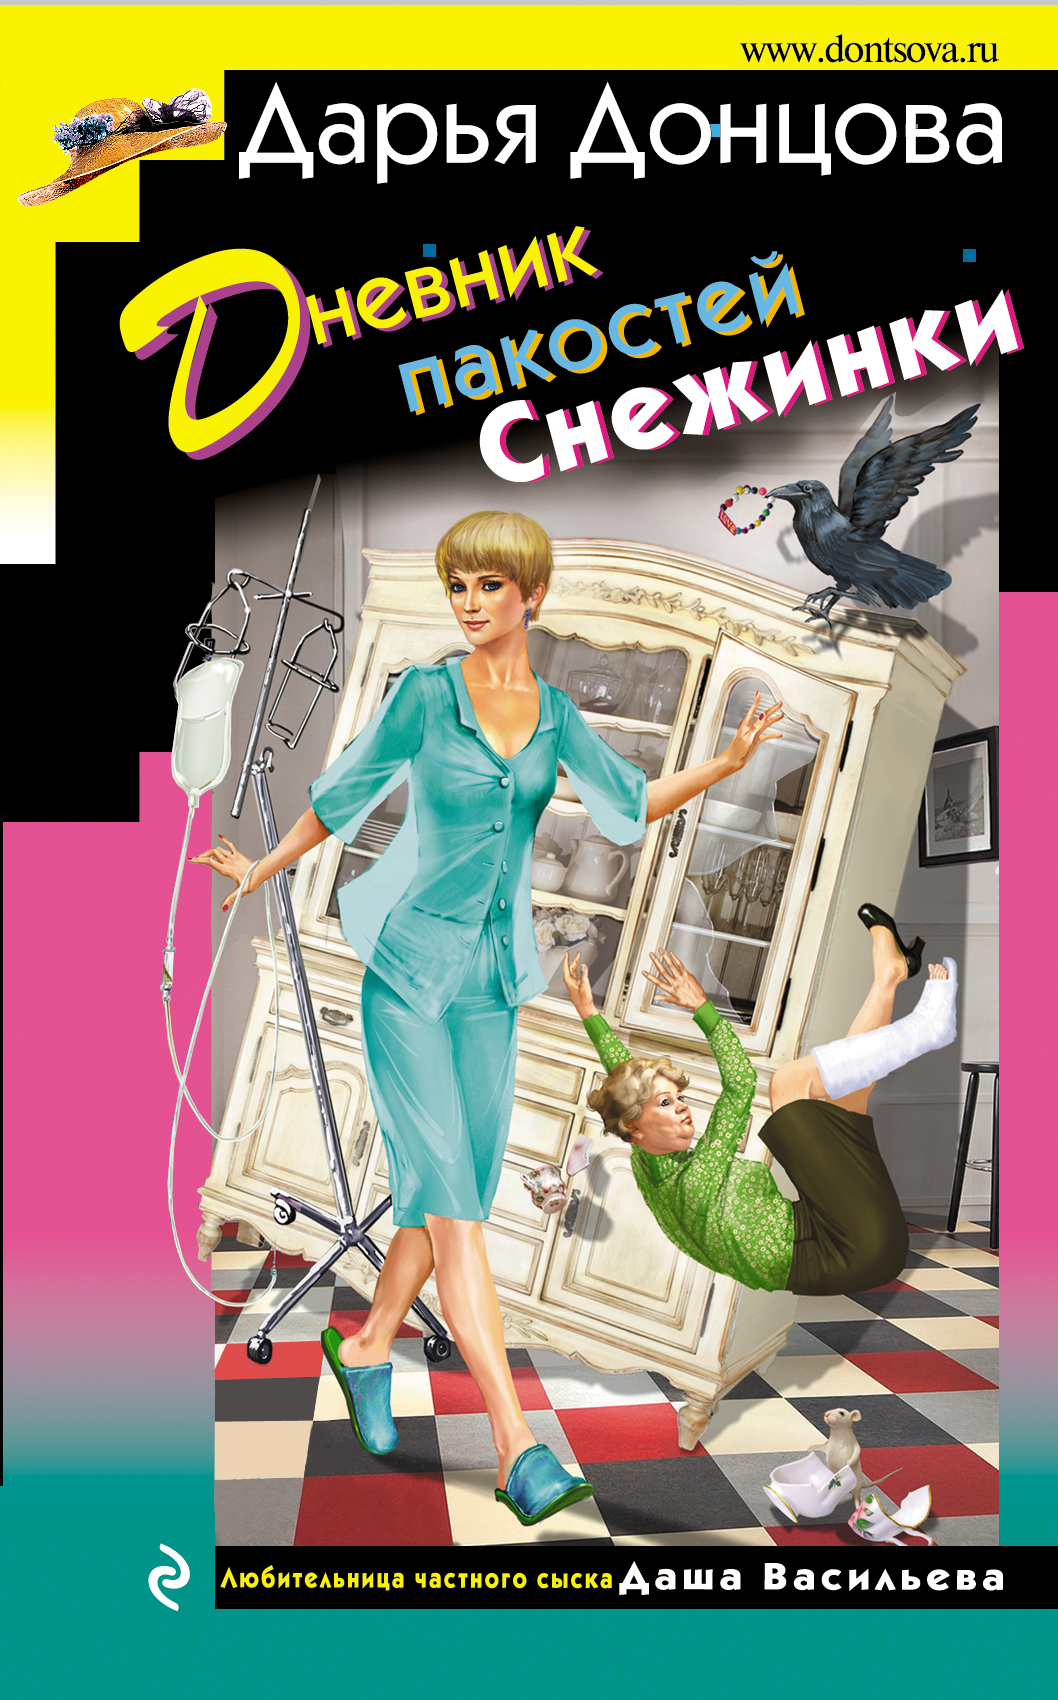 a9f8b4b582b8 Дарья Донцова, Дневник пакостей Снежинки – читать онлайн полностью ...